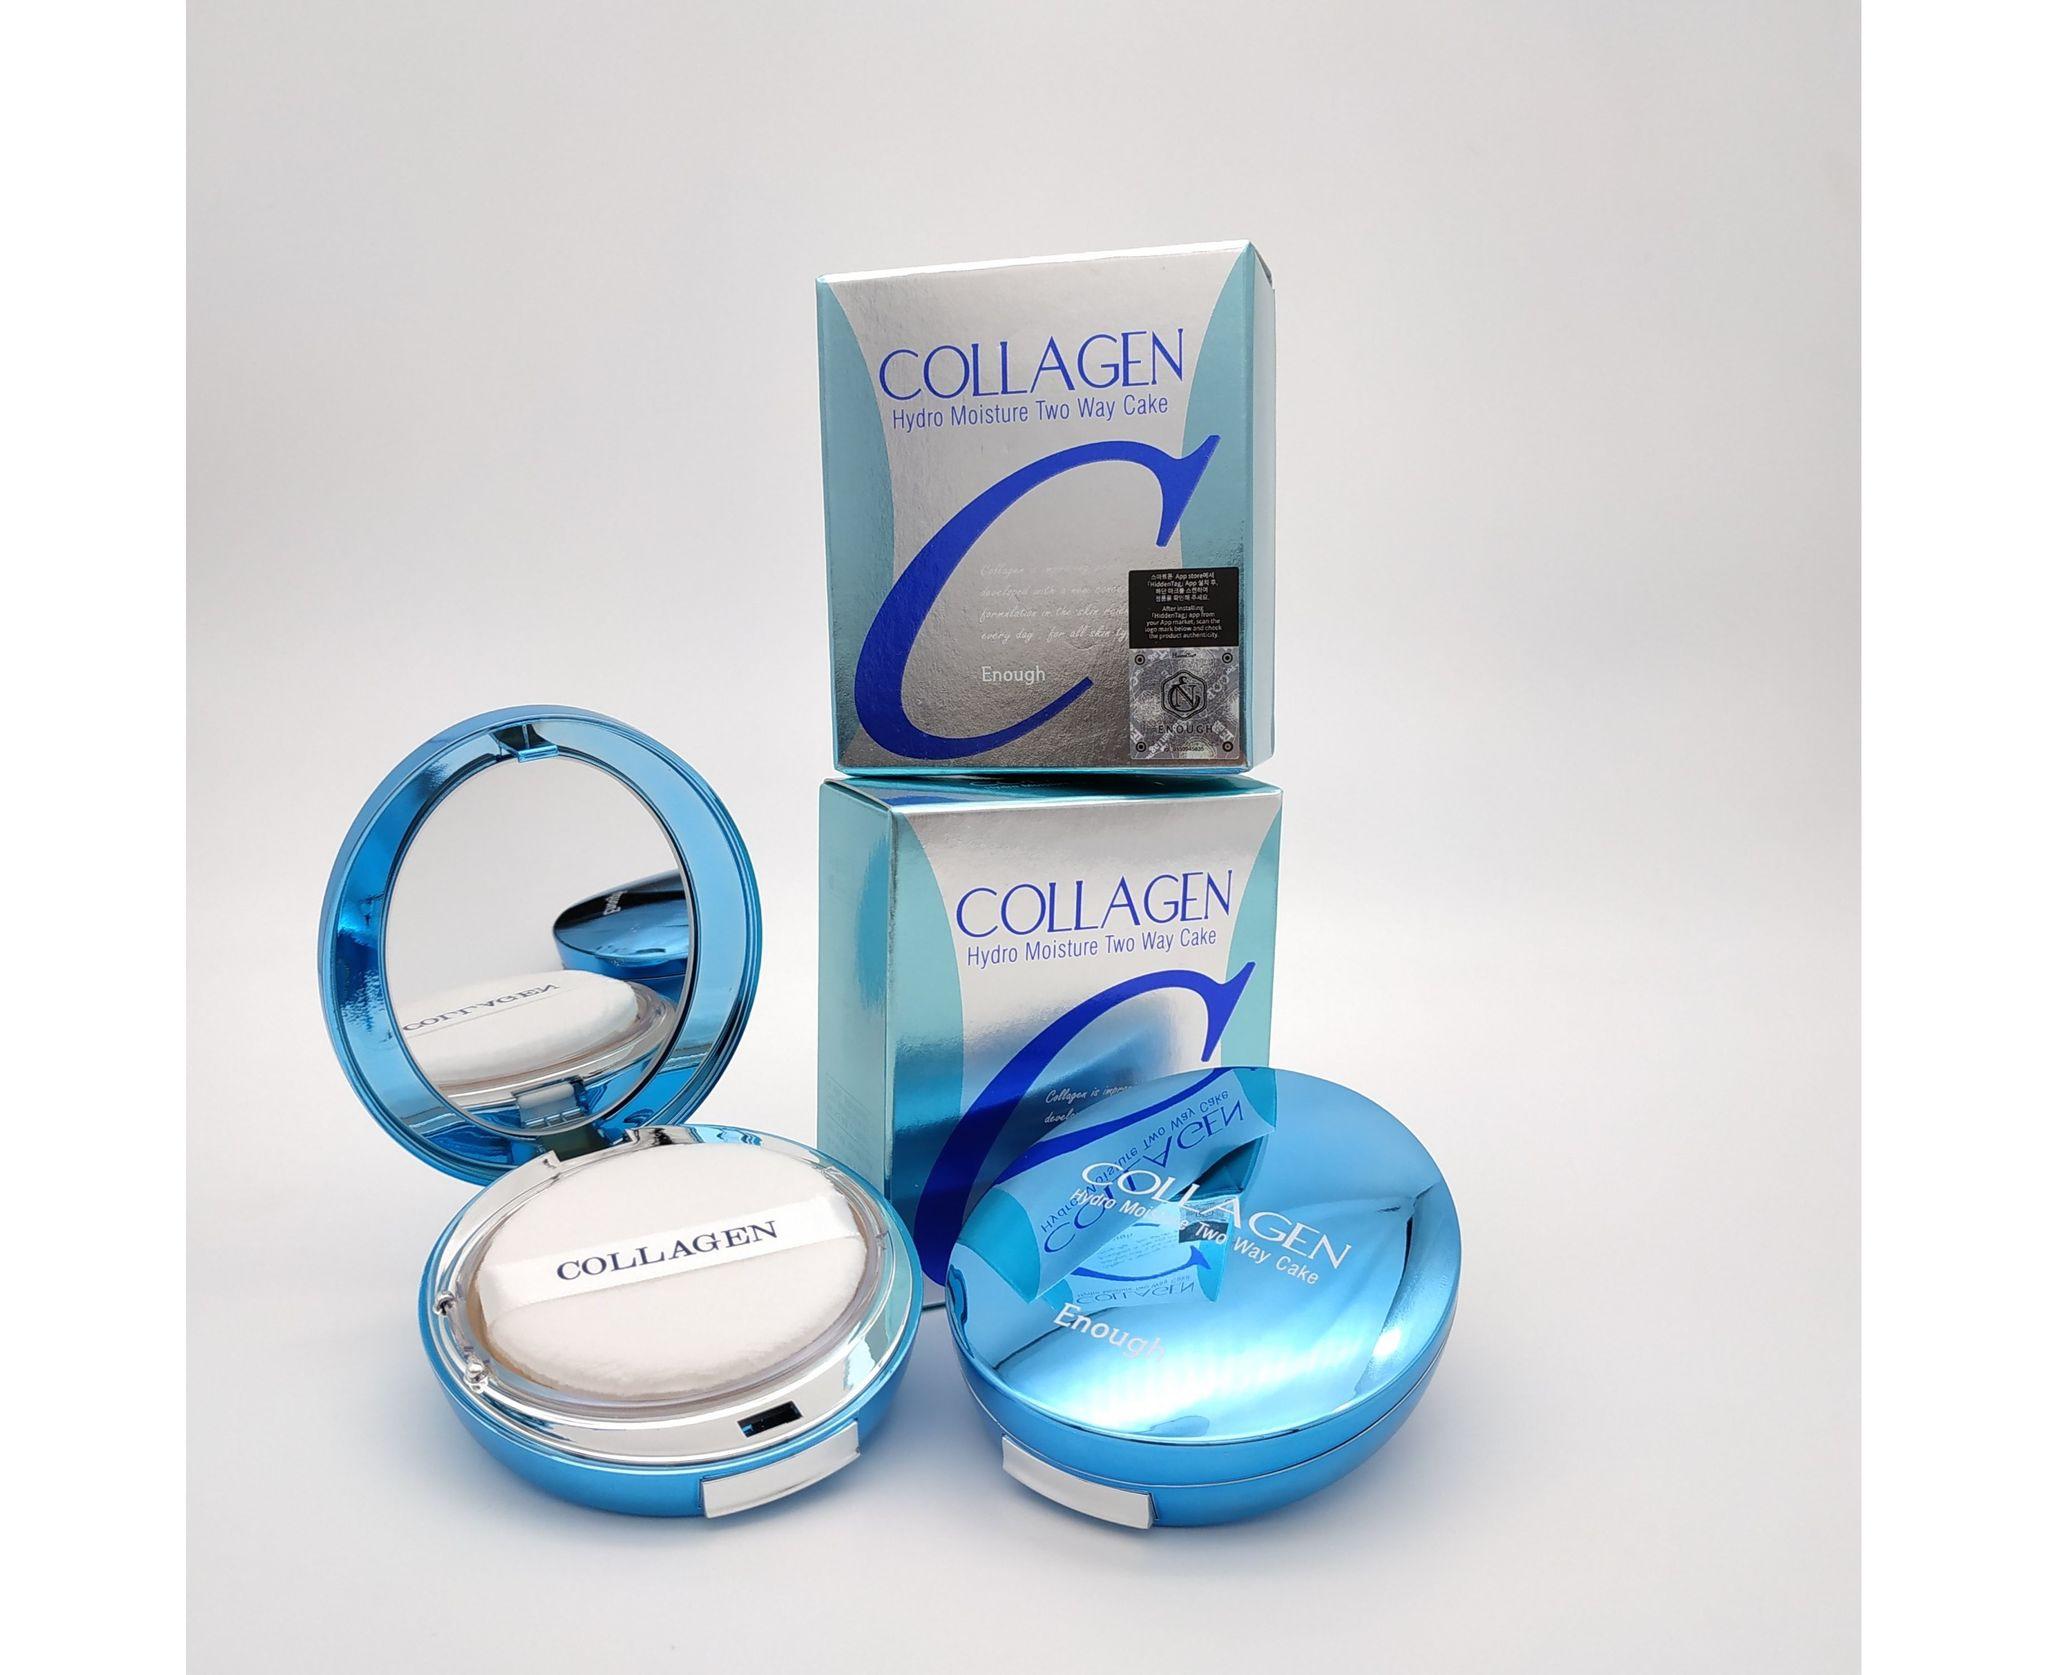 Enough Collagen Hydro Moisture Two Way Cake SPF25